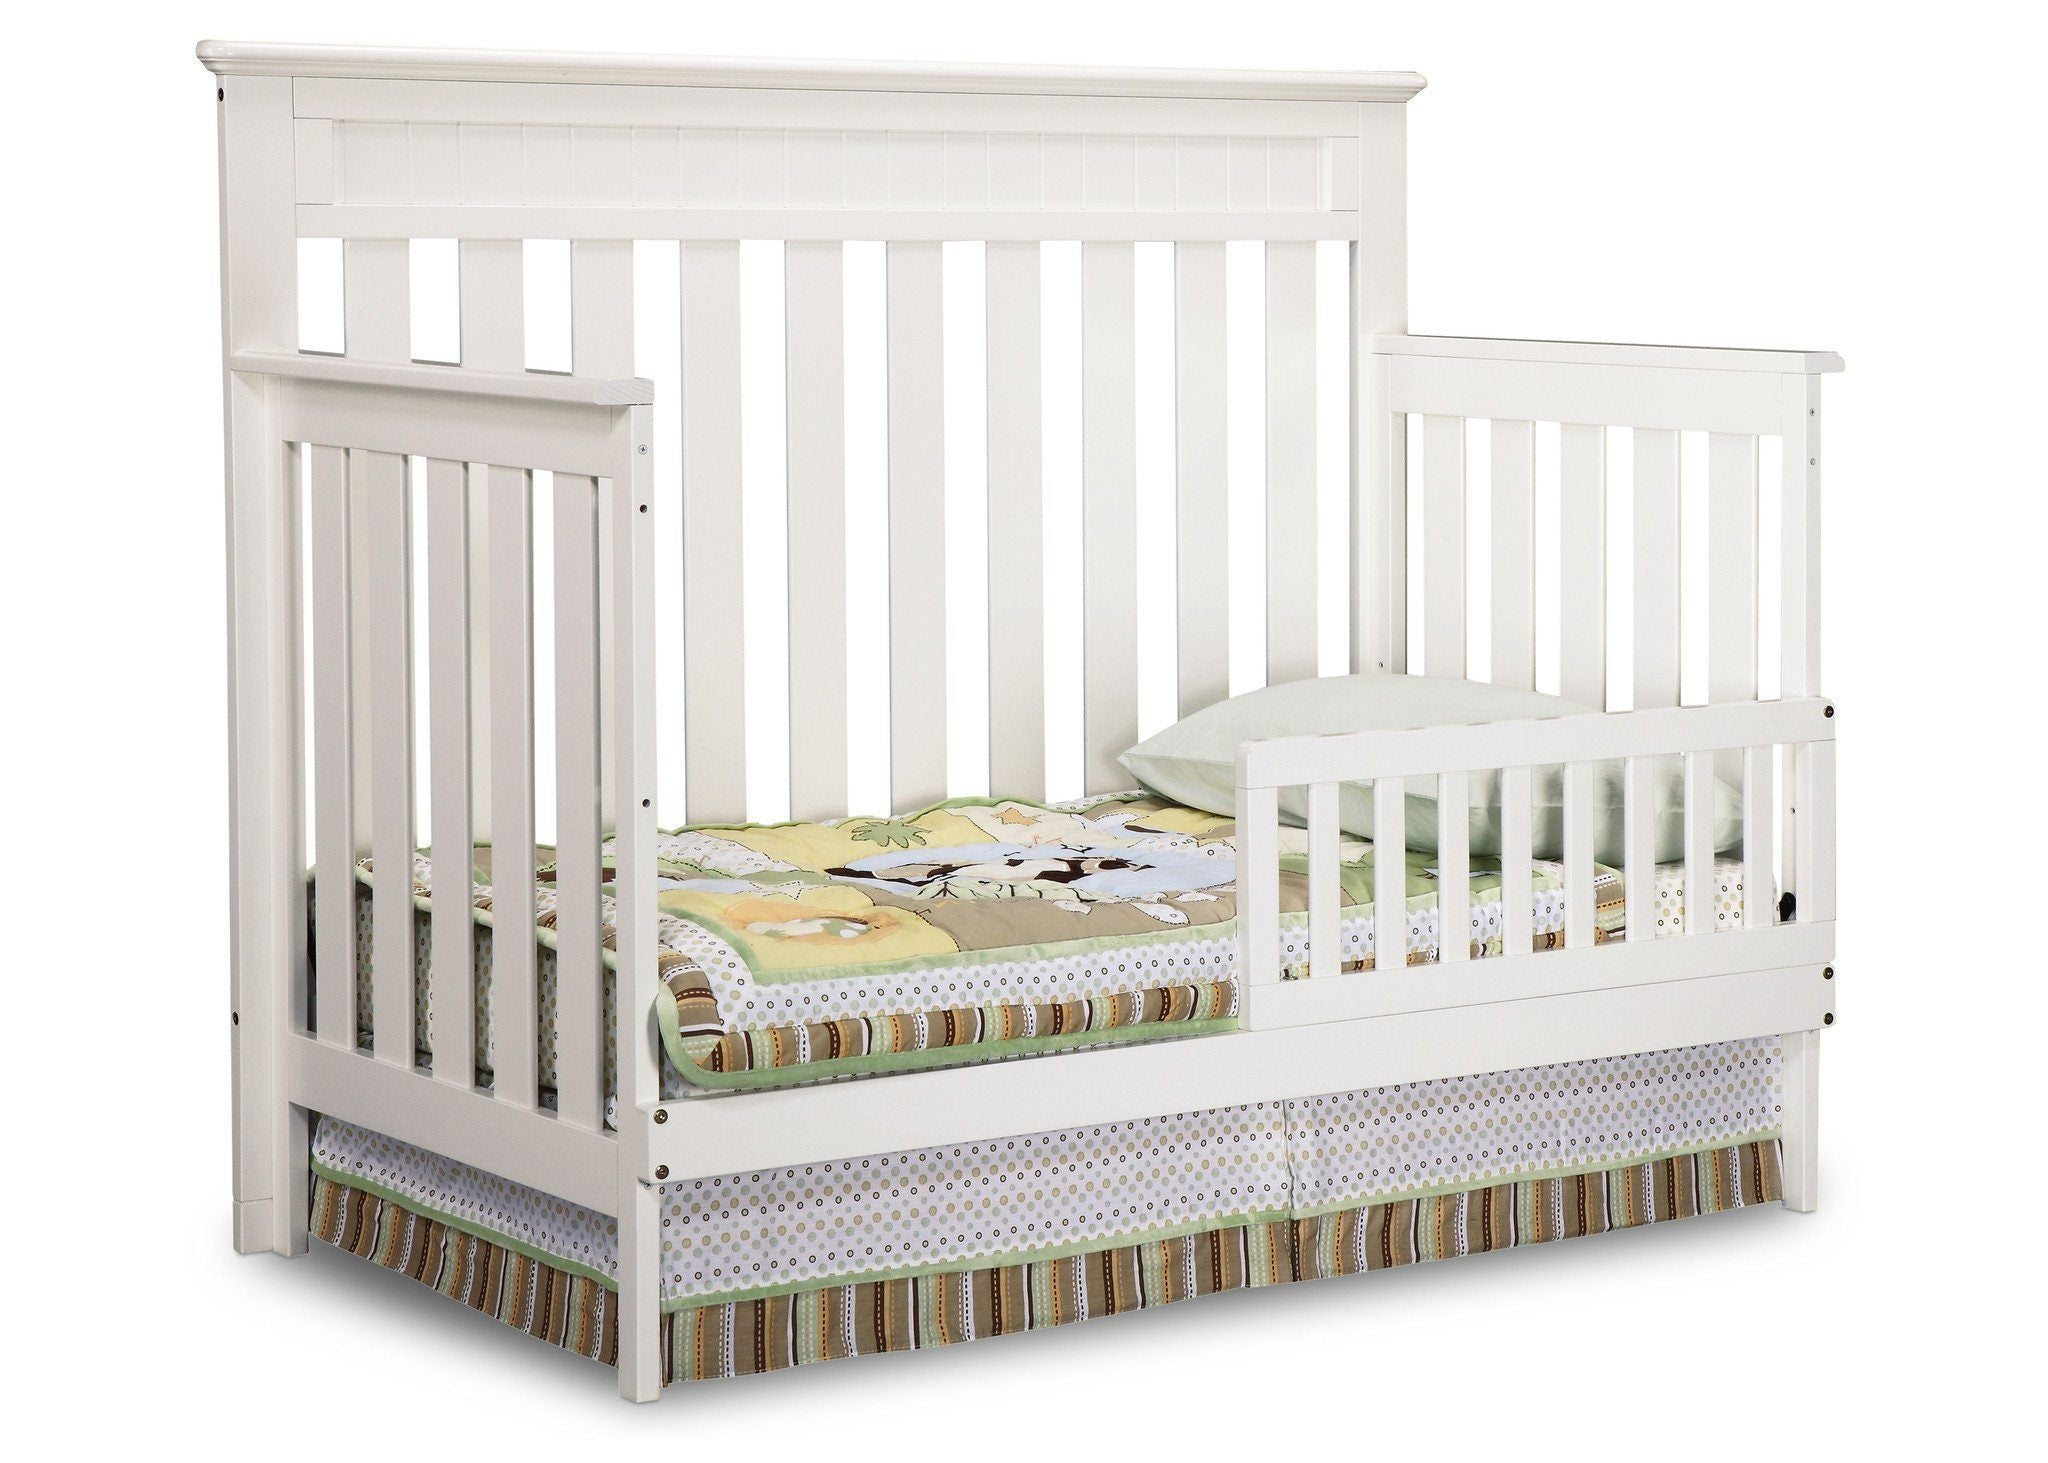 delta crib conversion kit instructions